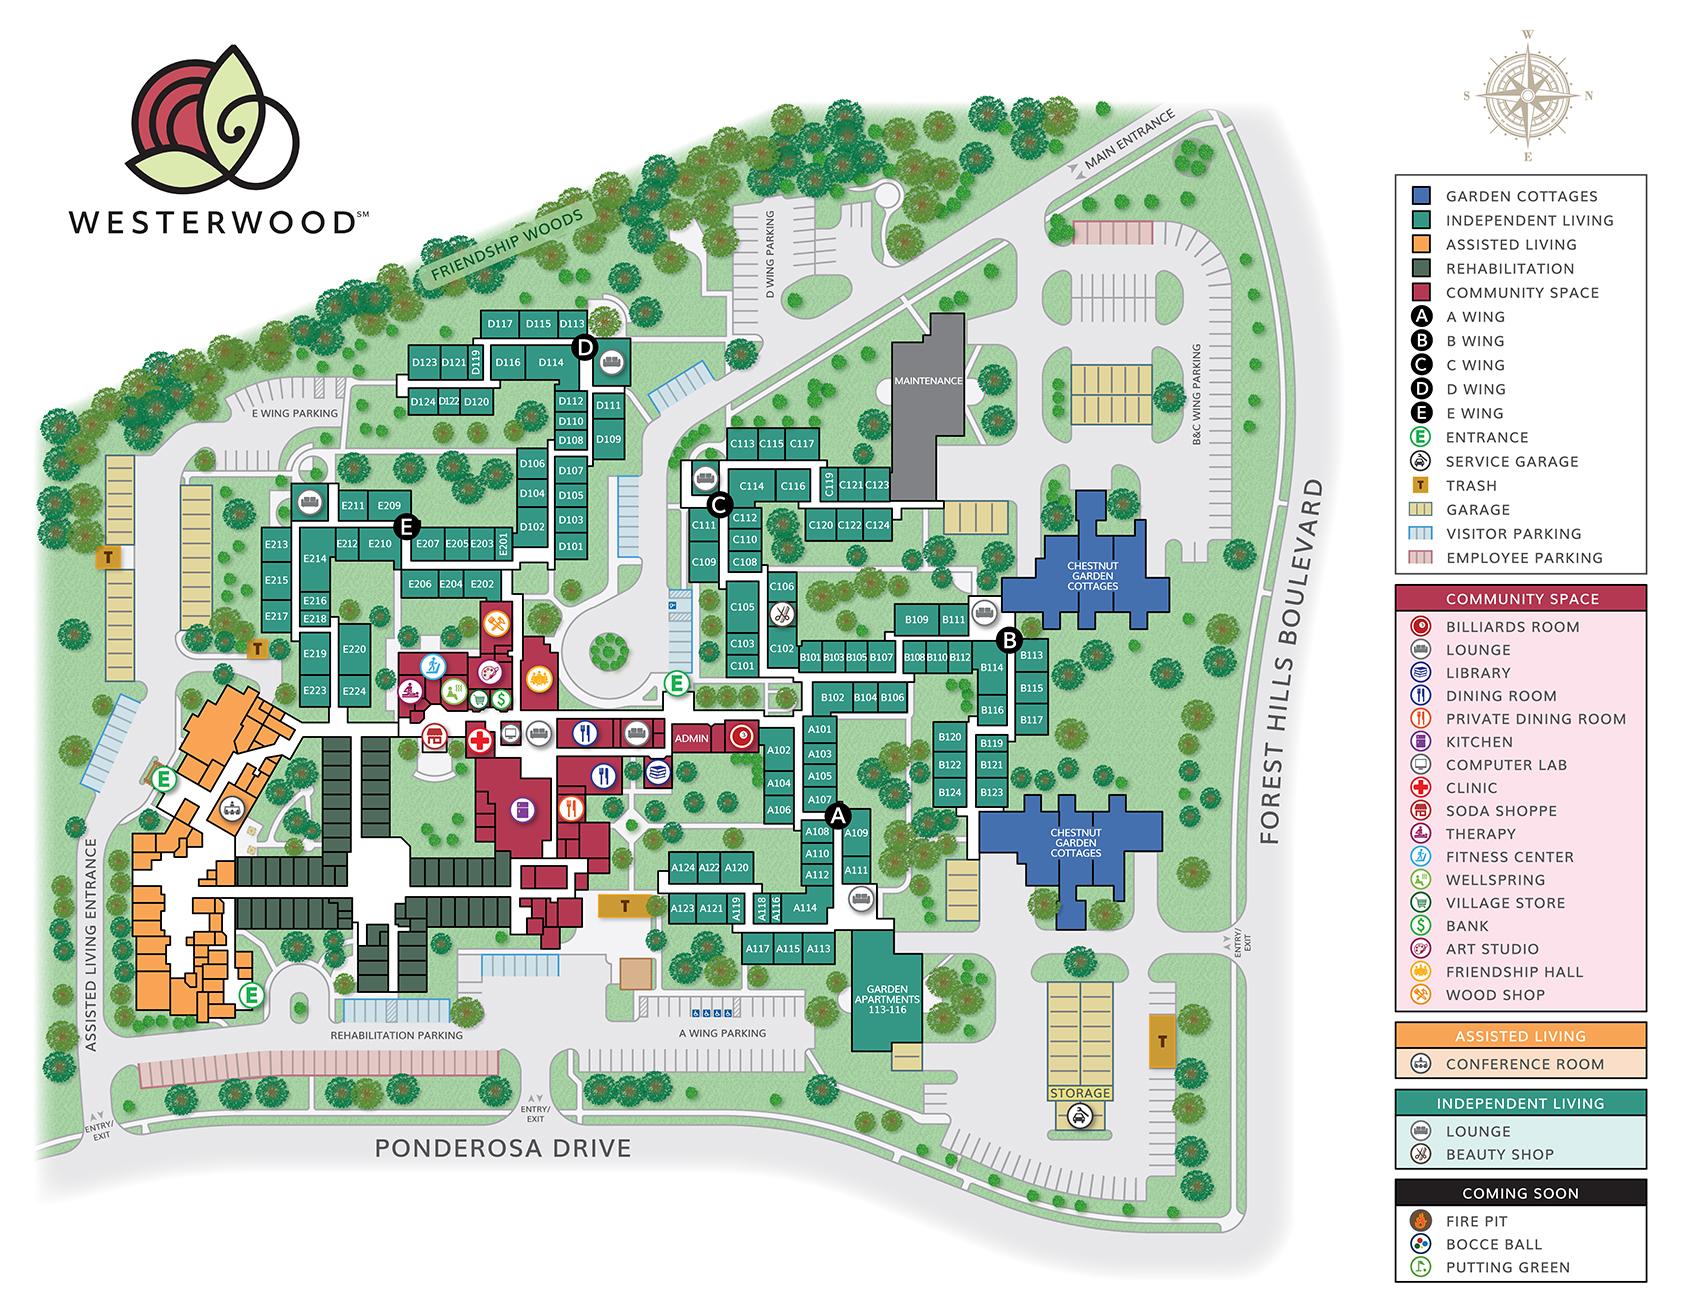 Westerwood campus map   Westerwood